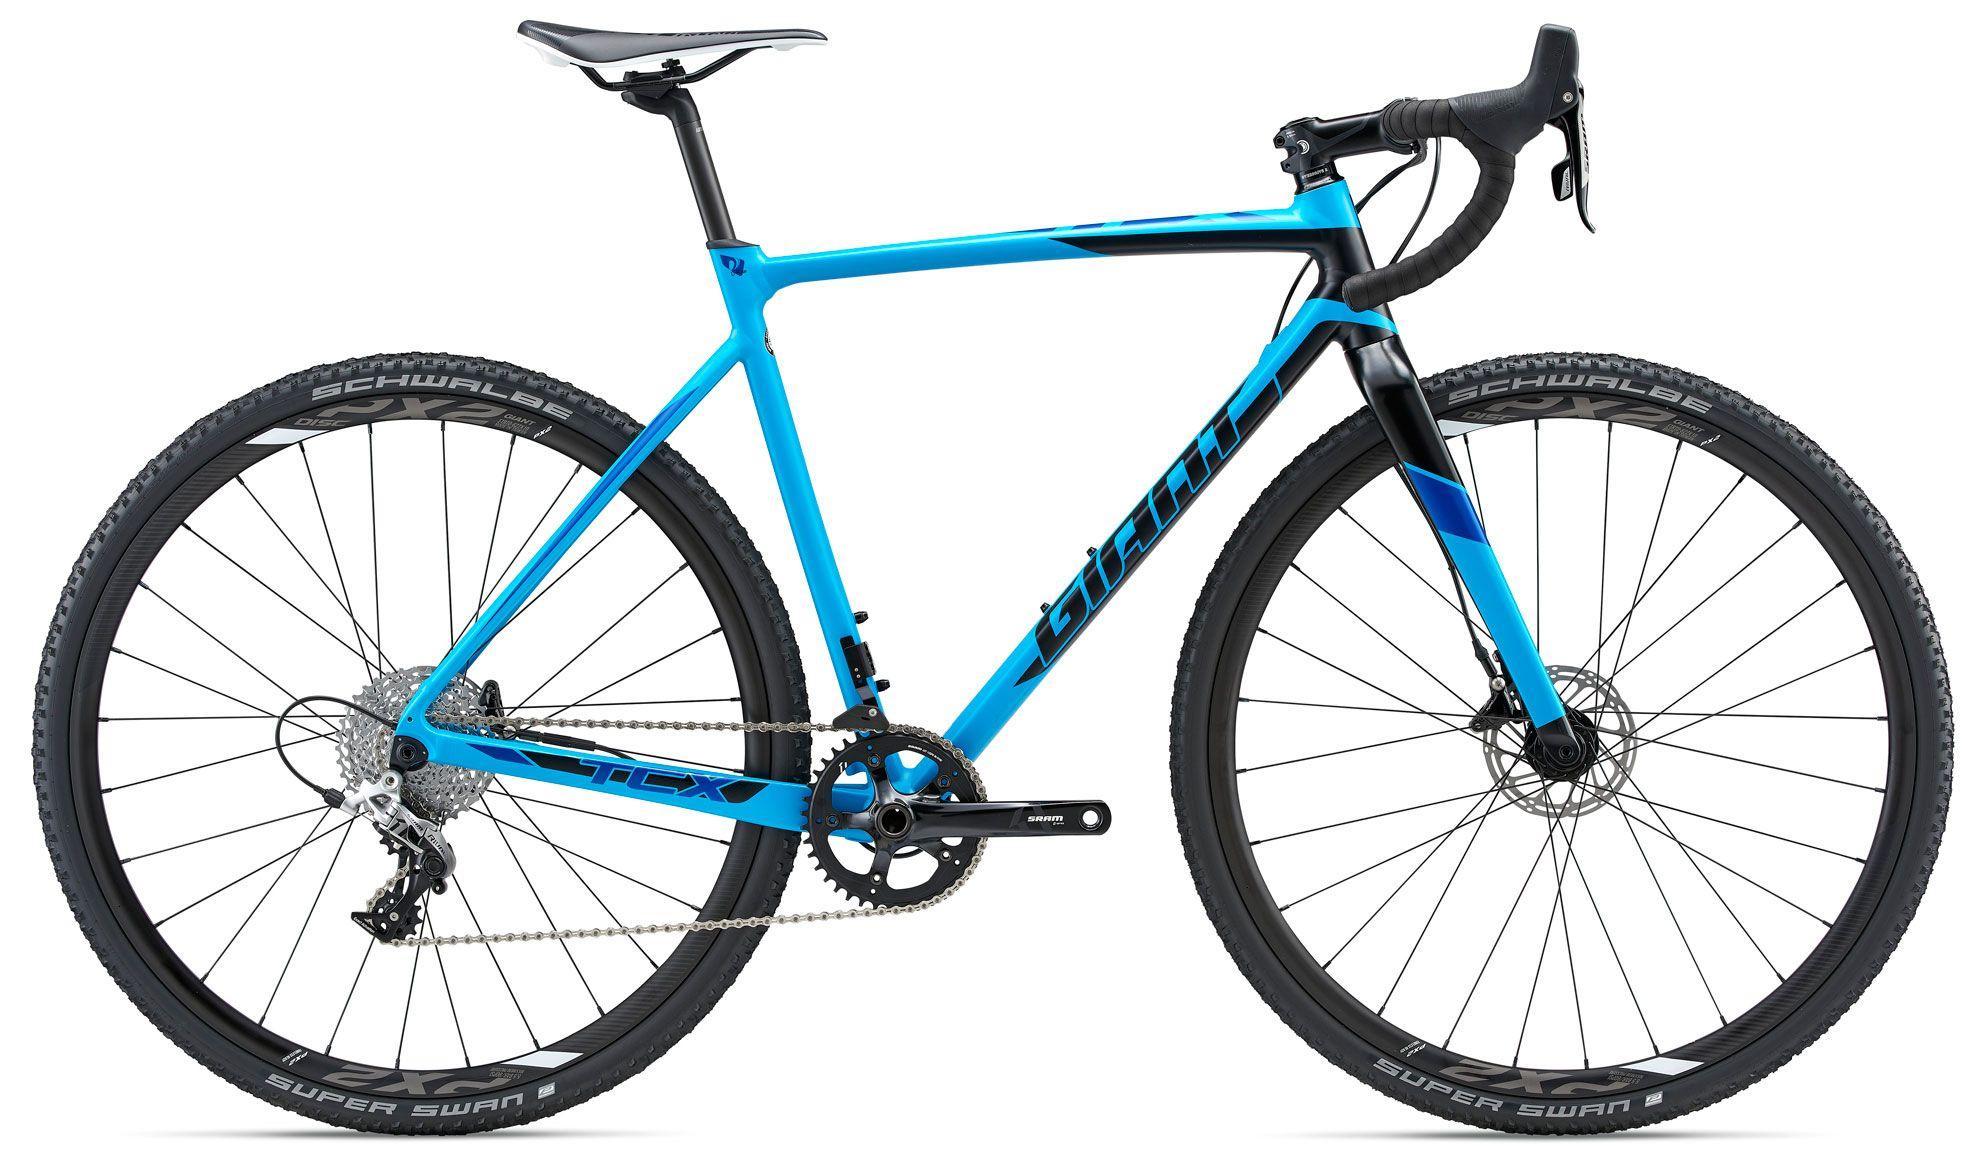 Велосипед Giant TCX SLR 1 2018 велосипед giant toughroad slr 1 2018